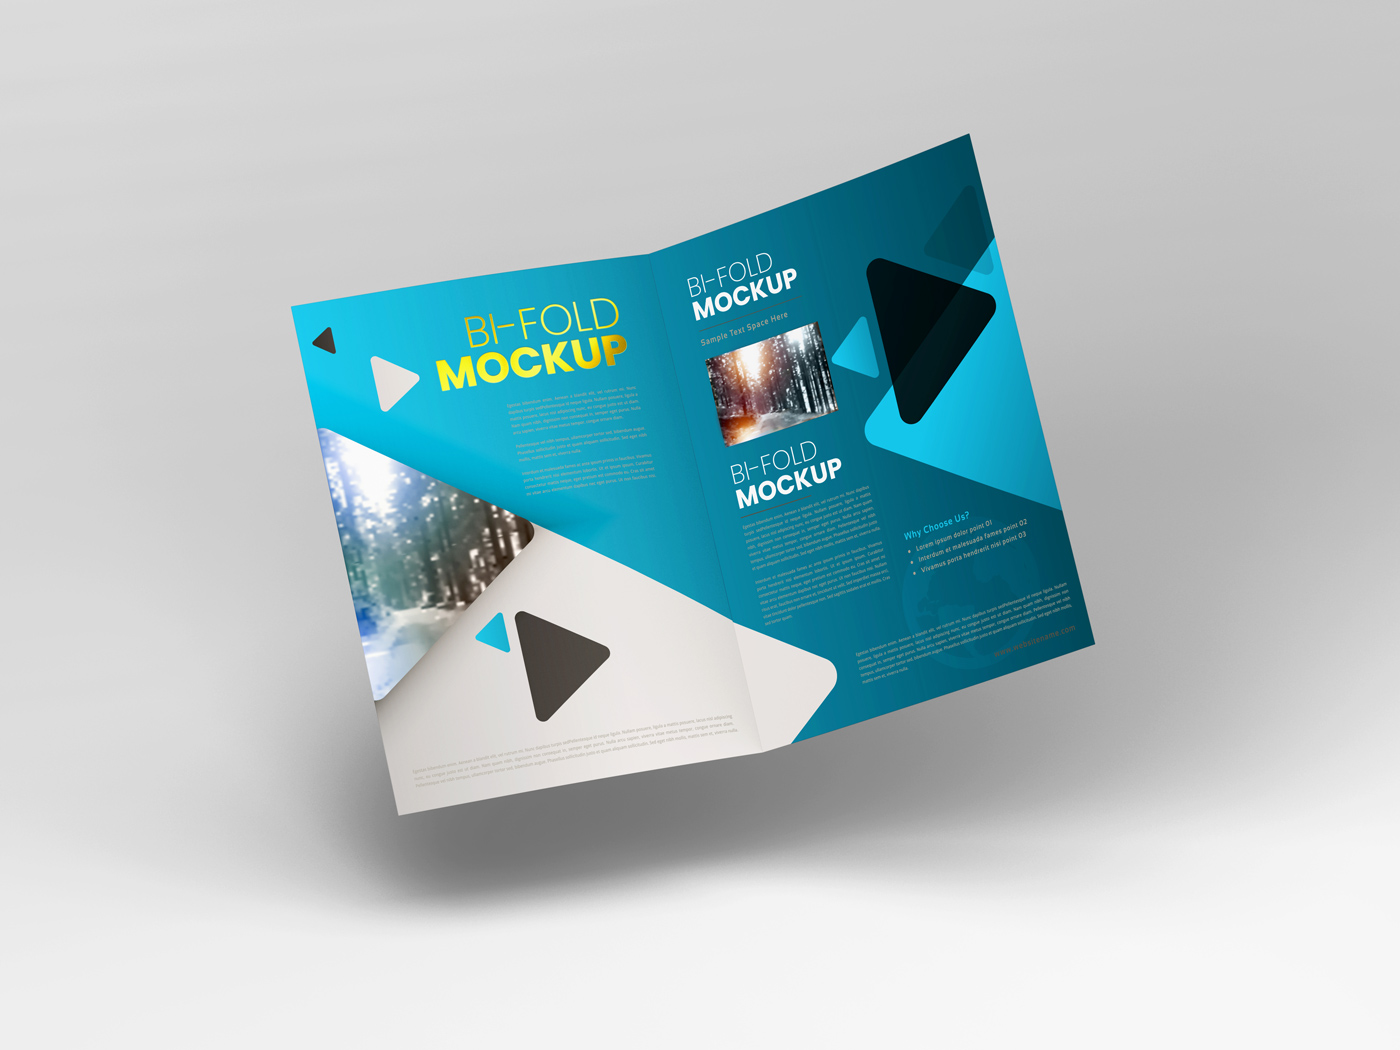 A4 Bifold Mockups V2 example image 5